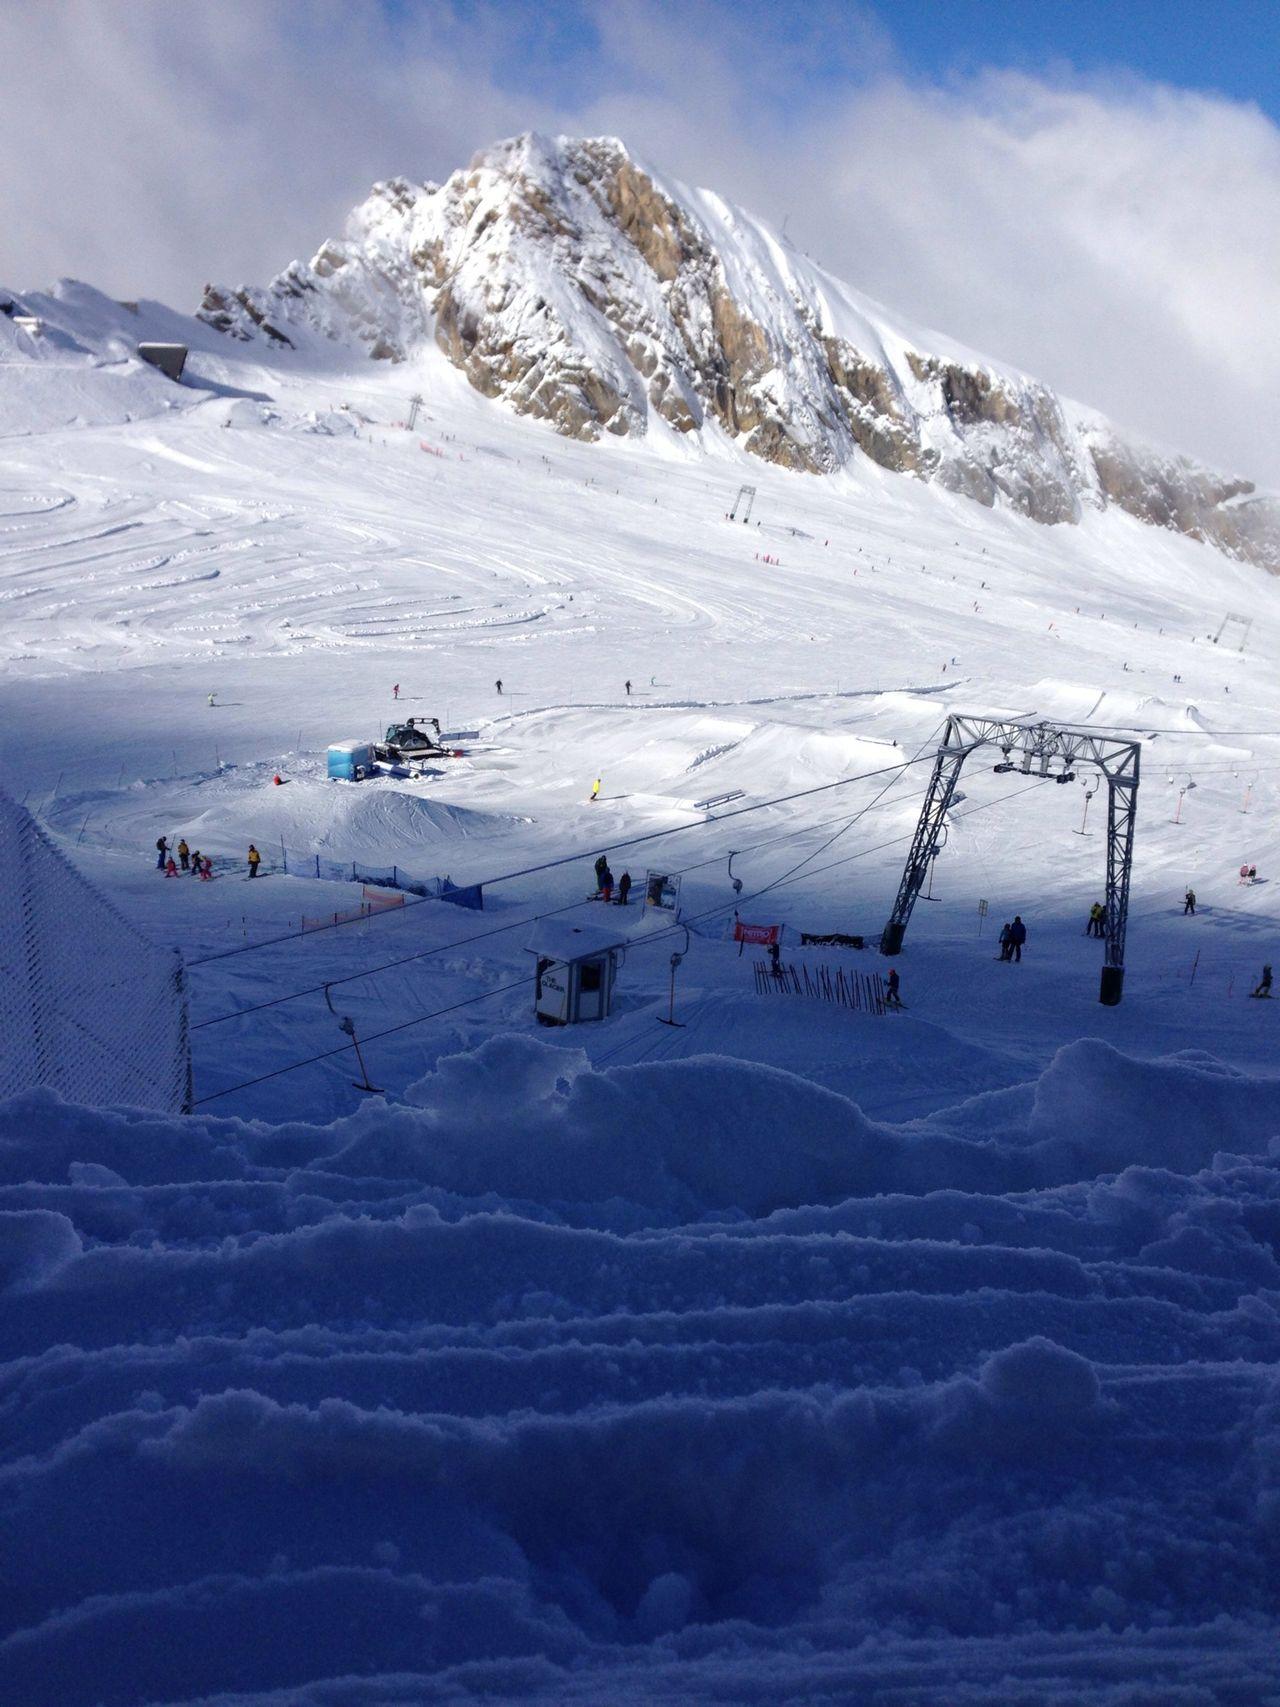 Escaping Relaxing Mountain Enjoying The Sun Mountain Range Outdoor Photography Cable Skiing Walking On Snow